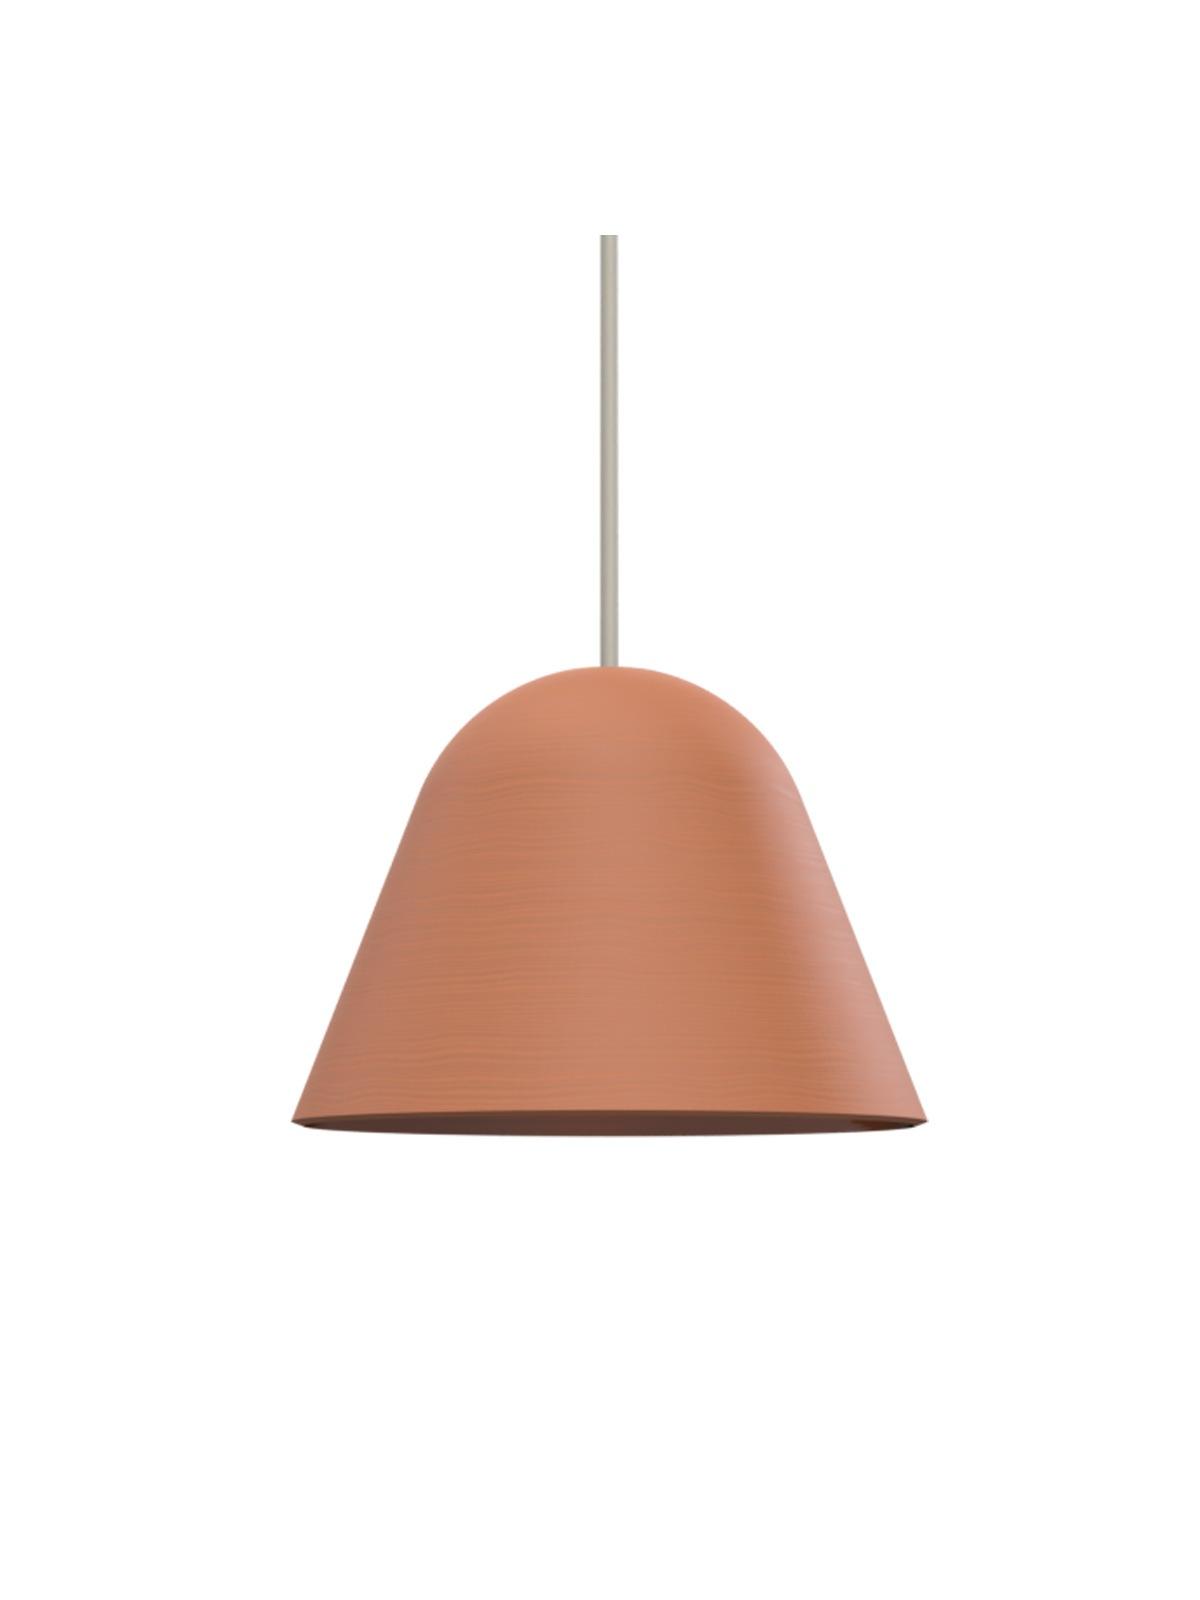 Okina 20 Pott Keramik Leuchte DesignOrt Lampen Onlineshop Berlin